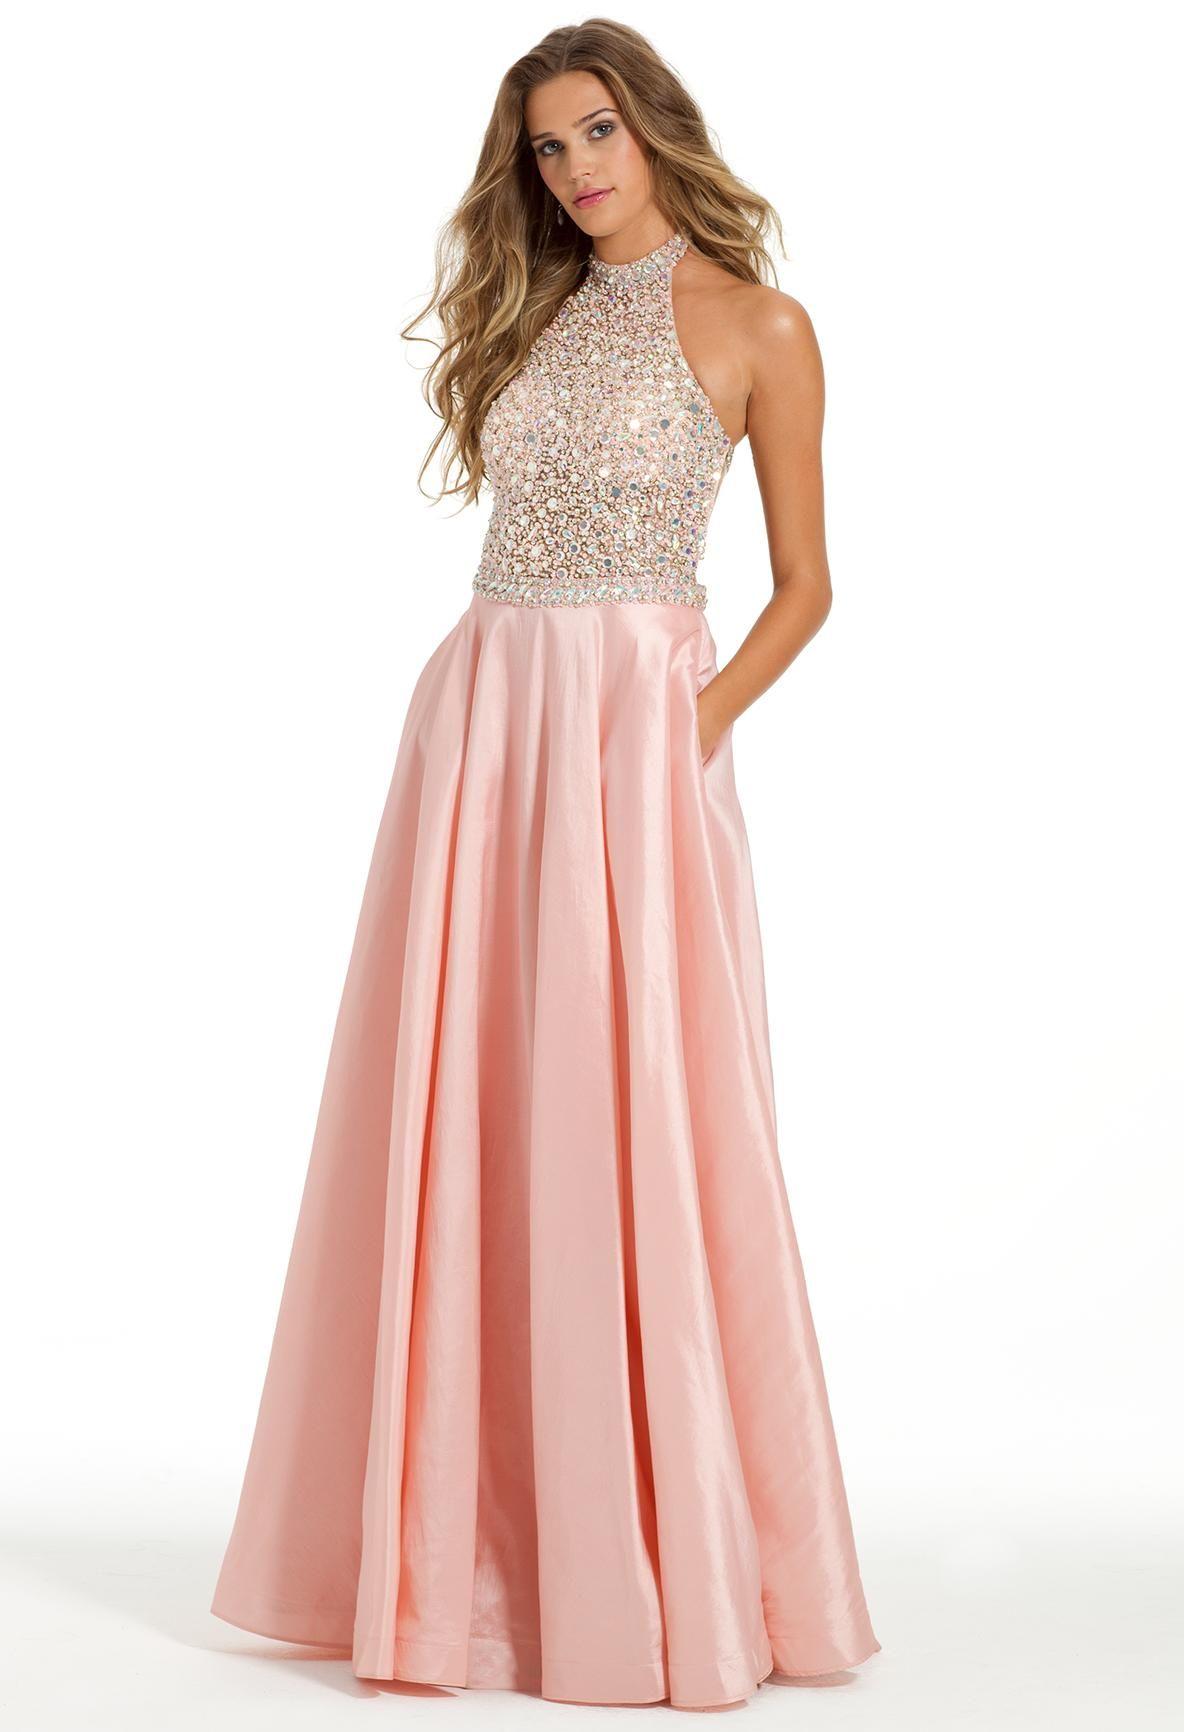 Taffeta Ballgown for Prom 2016 #camillelavie #CLVprom | PROM DRESSES ...